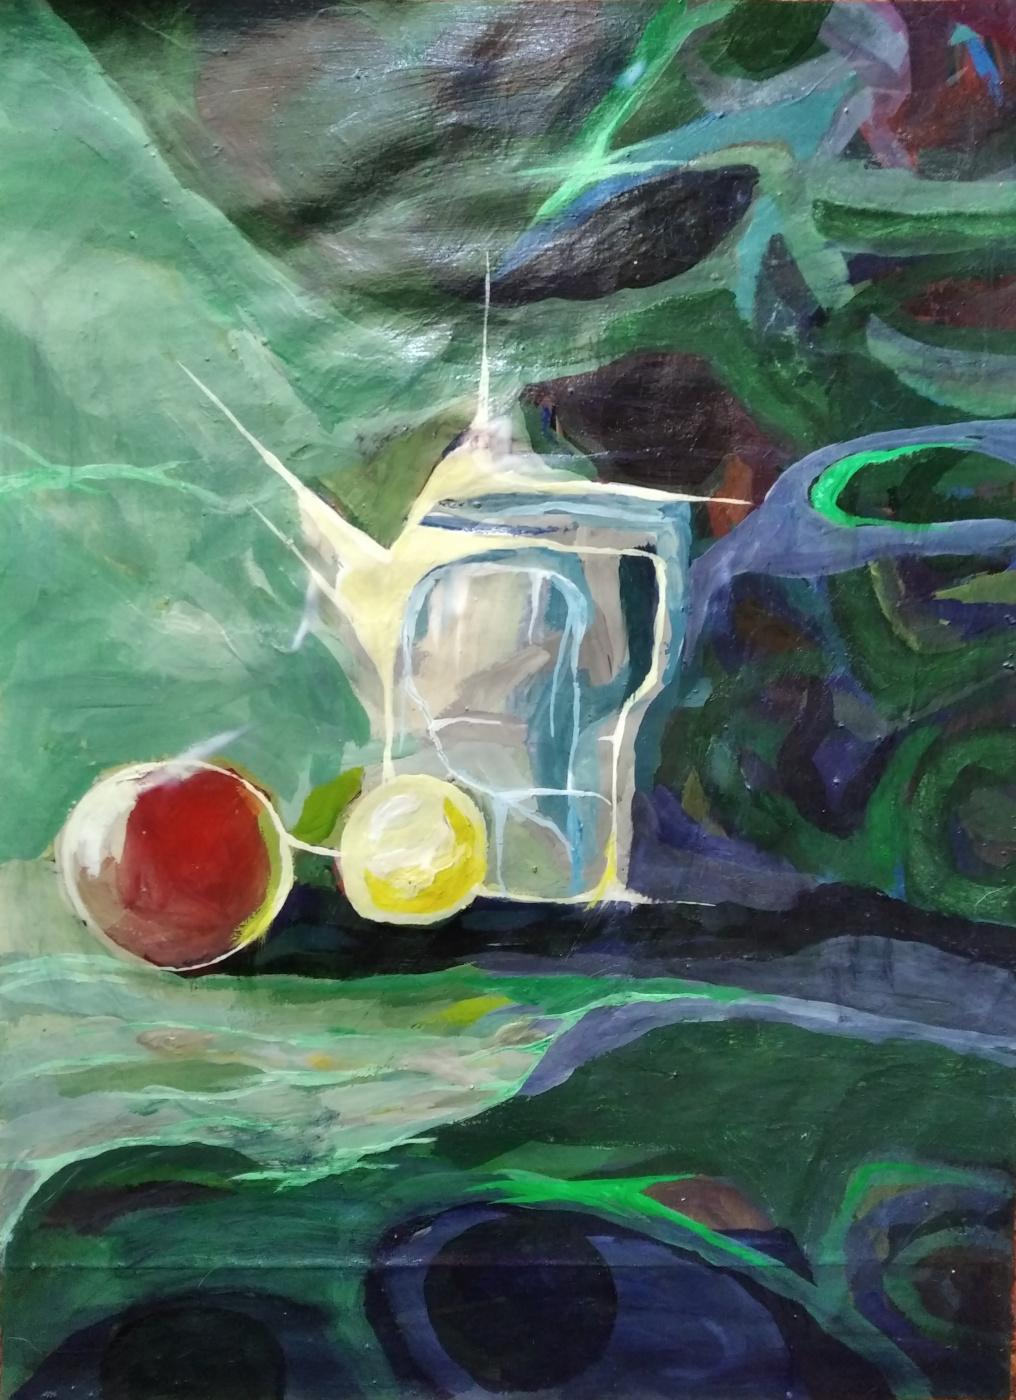 Alexandr Glukhov. Натюрморт в зеленых тонах